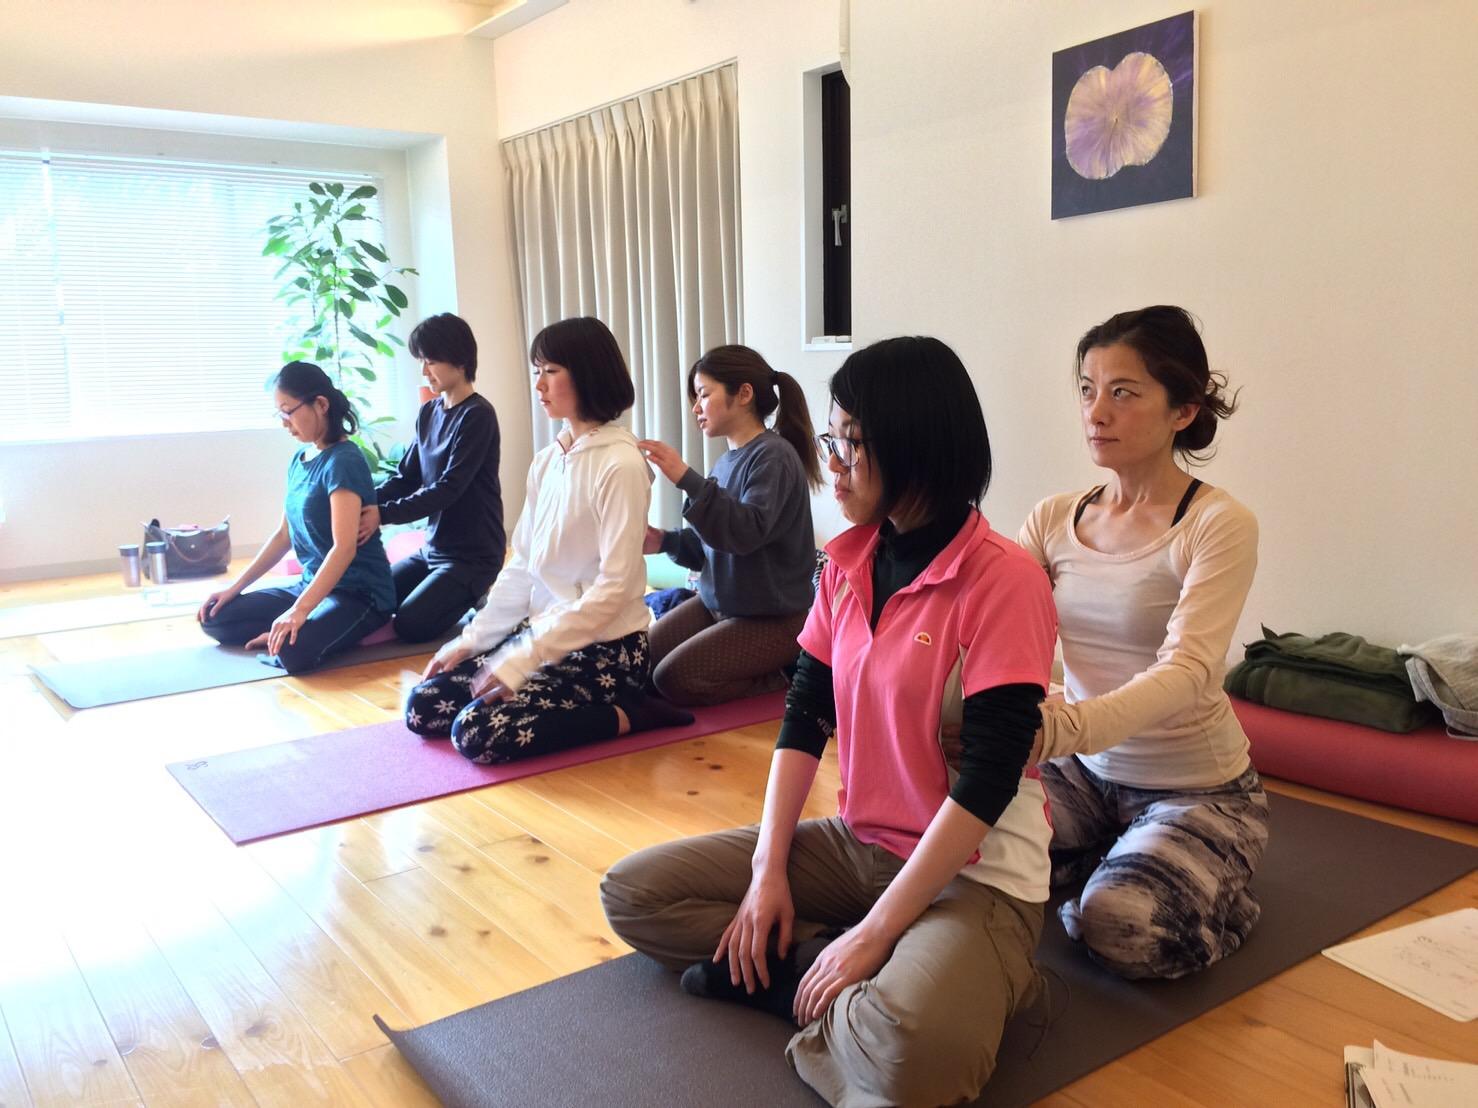 Hot Yoga Studio rcu(ホットヨガスタジオリチュ) - 10/22スタート初心者からのヨガ養成25時間 平日開催です。の写真2